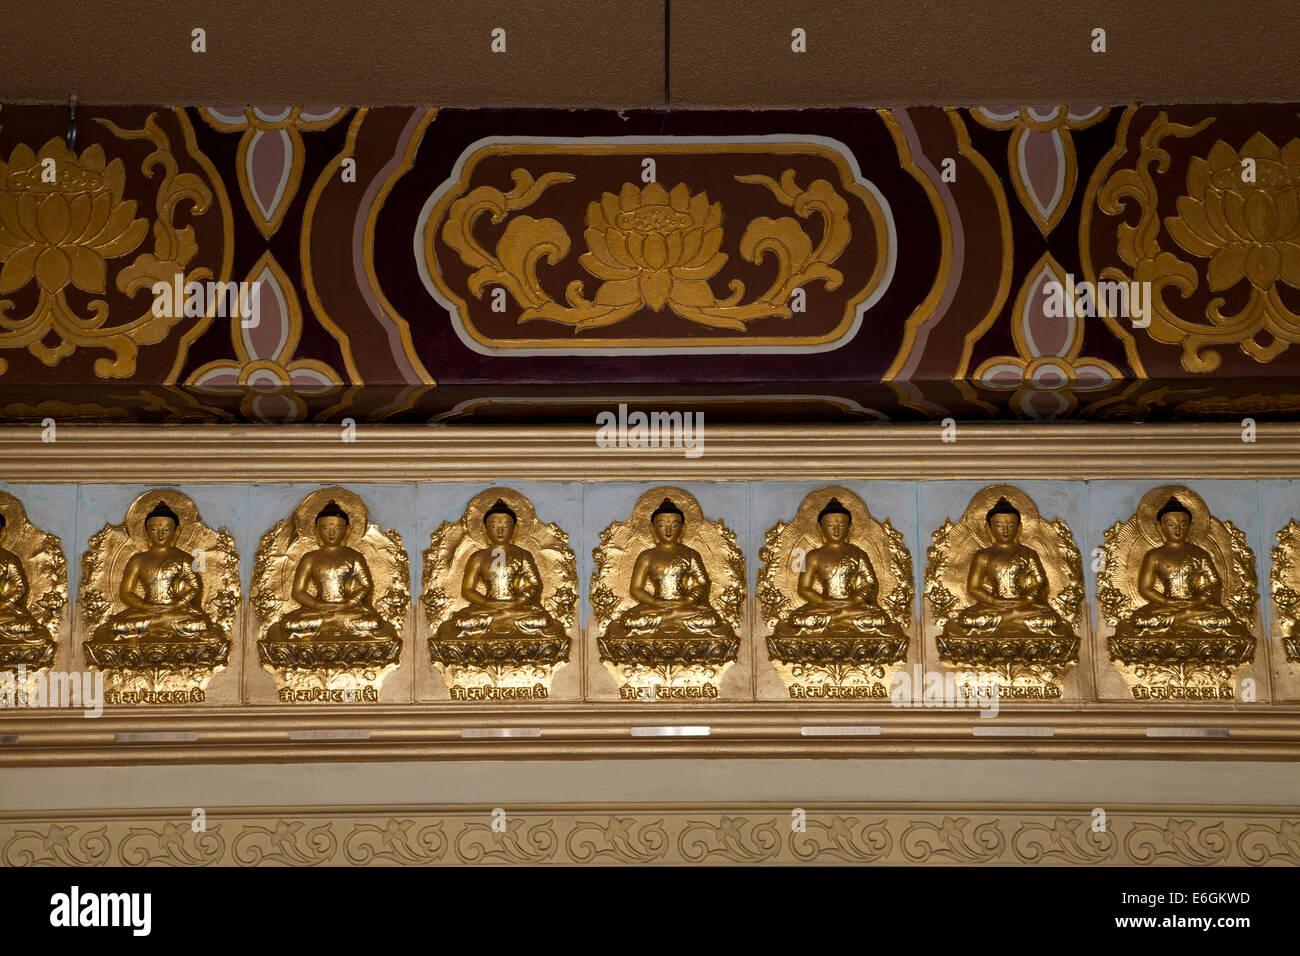 Figures of gold Buddha adorning the interior corridor of the Hsi Lai Buddhist Temple, Hacienda Heights, California, - Stock Image